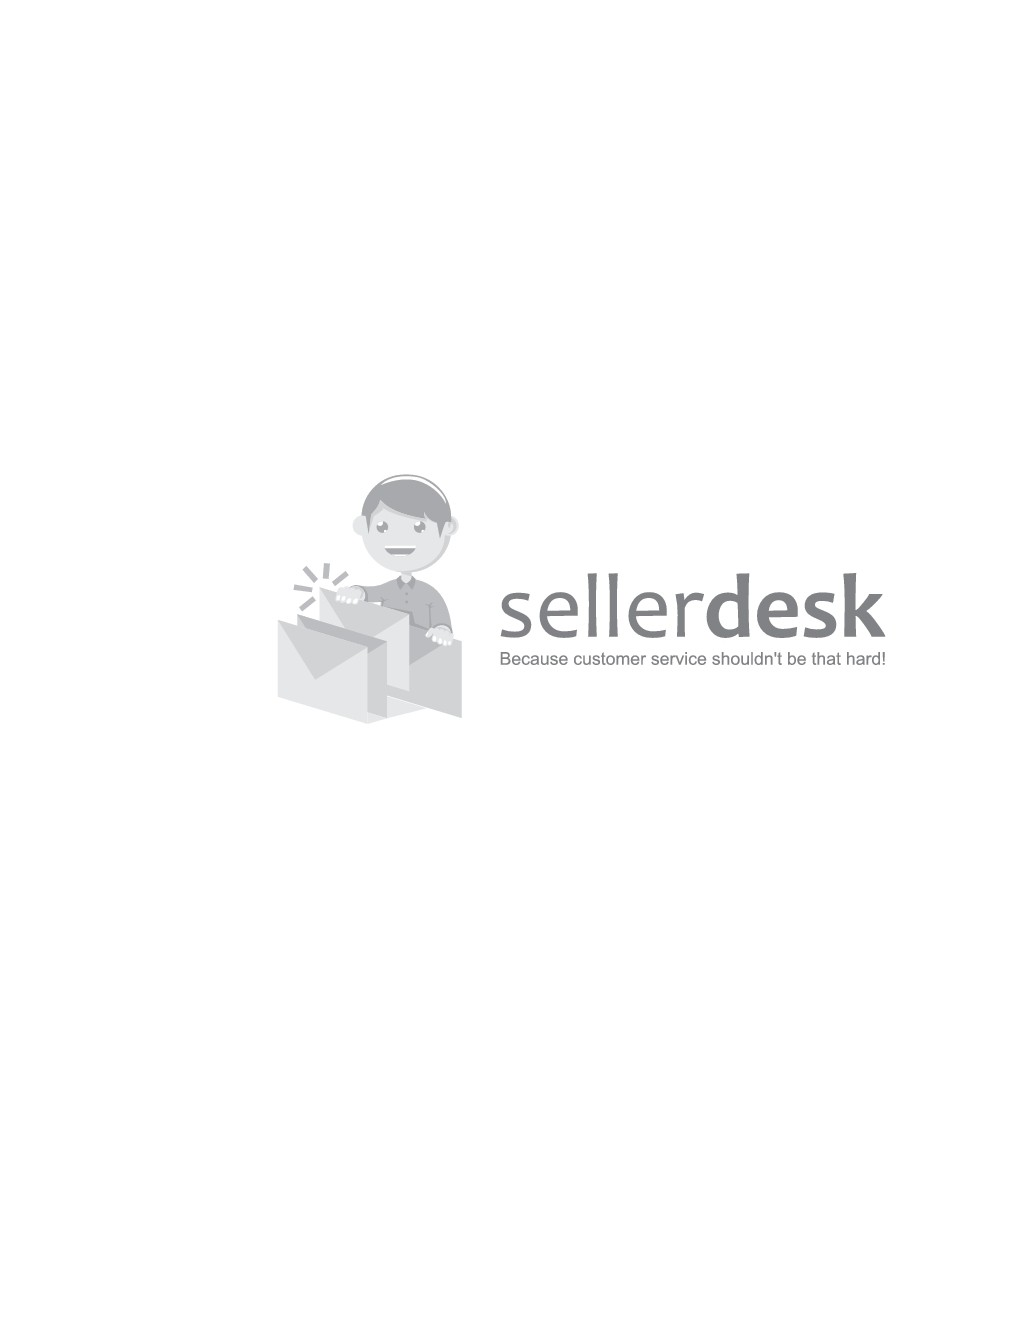 Design a unique minimalistic or cartoon logo for Amazon Helpdesk